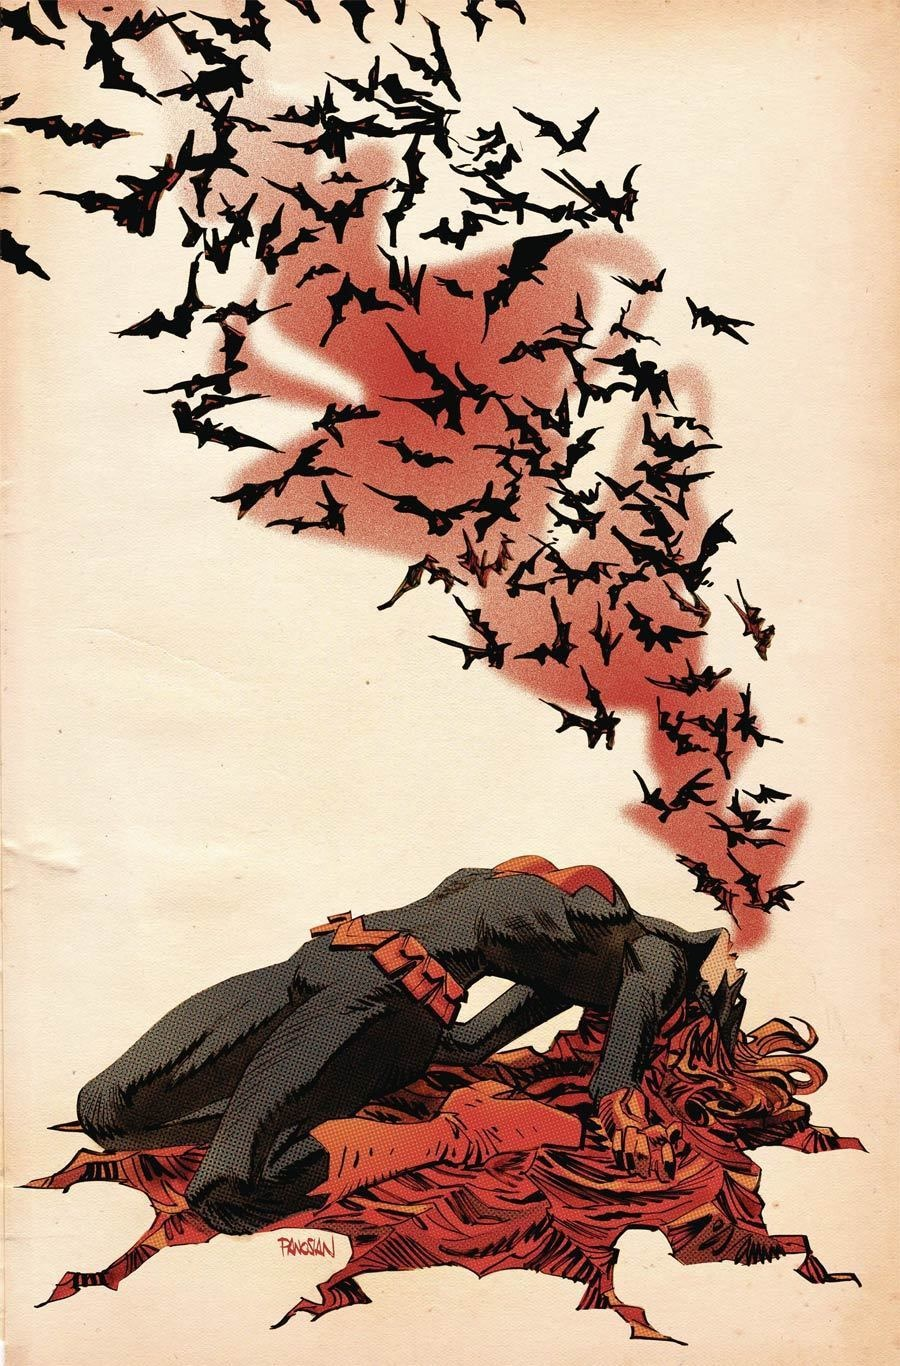 Batwoman Vol 3 15 Textless.jpg